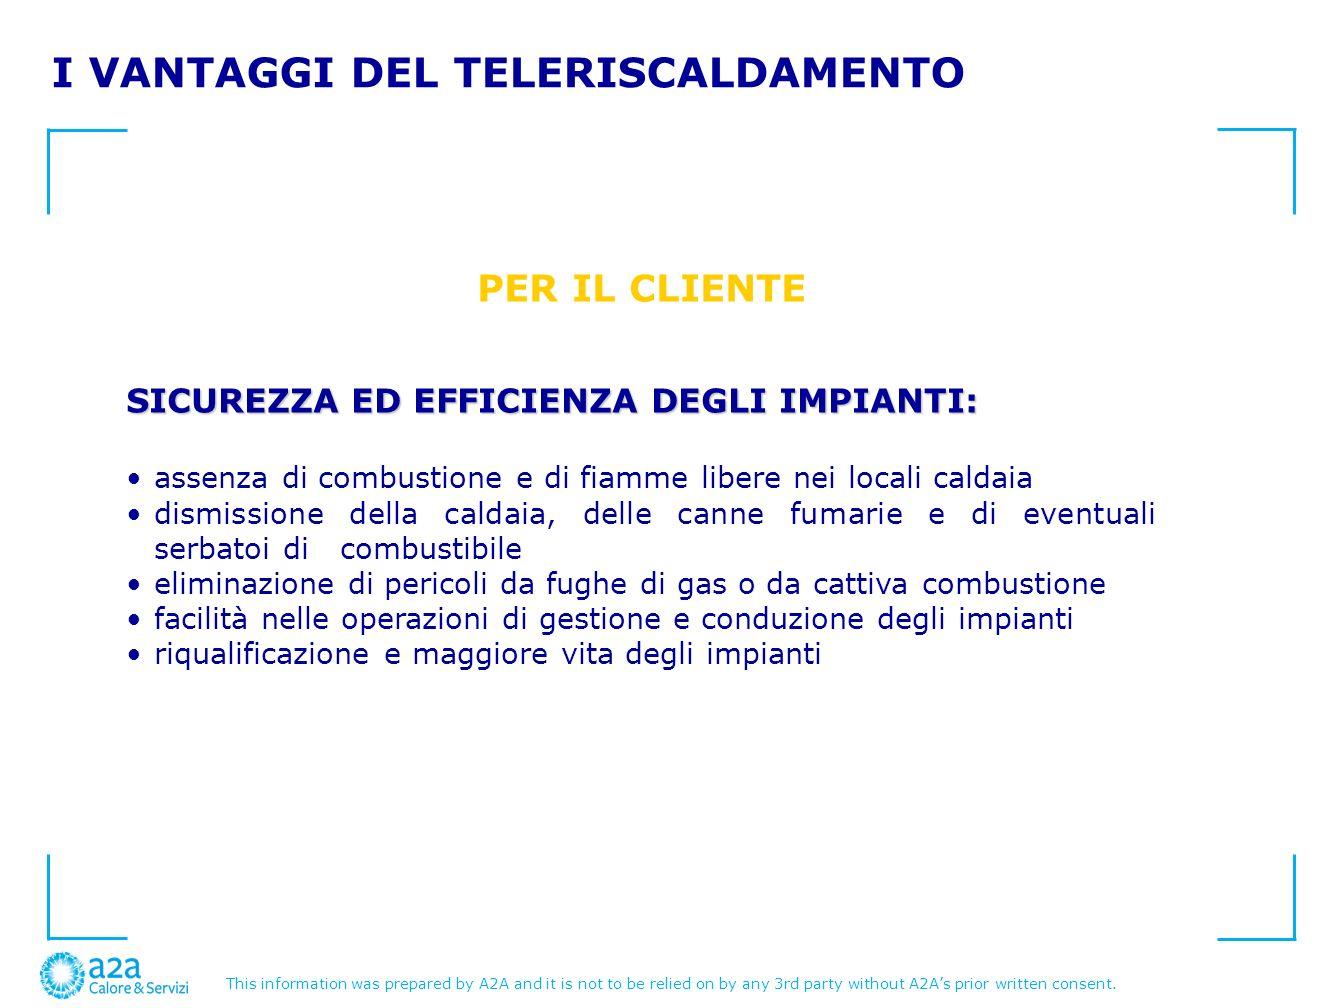 I VANTAGGI DEL TELERISCALDAMENTO